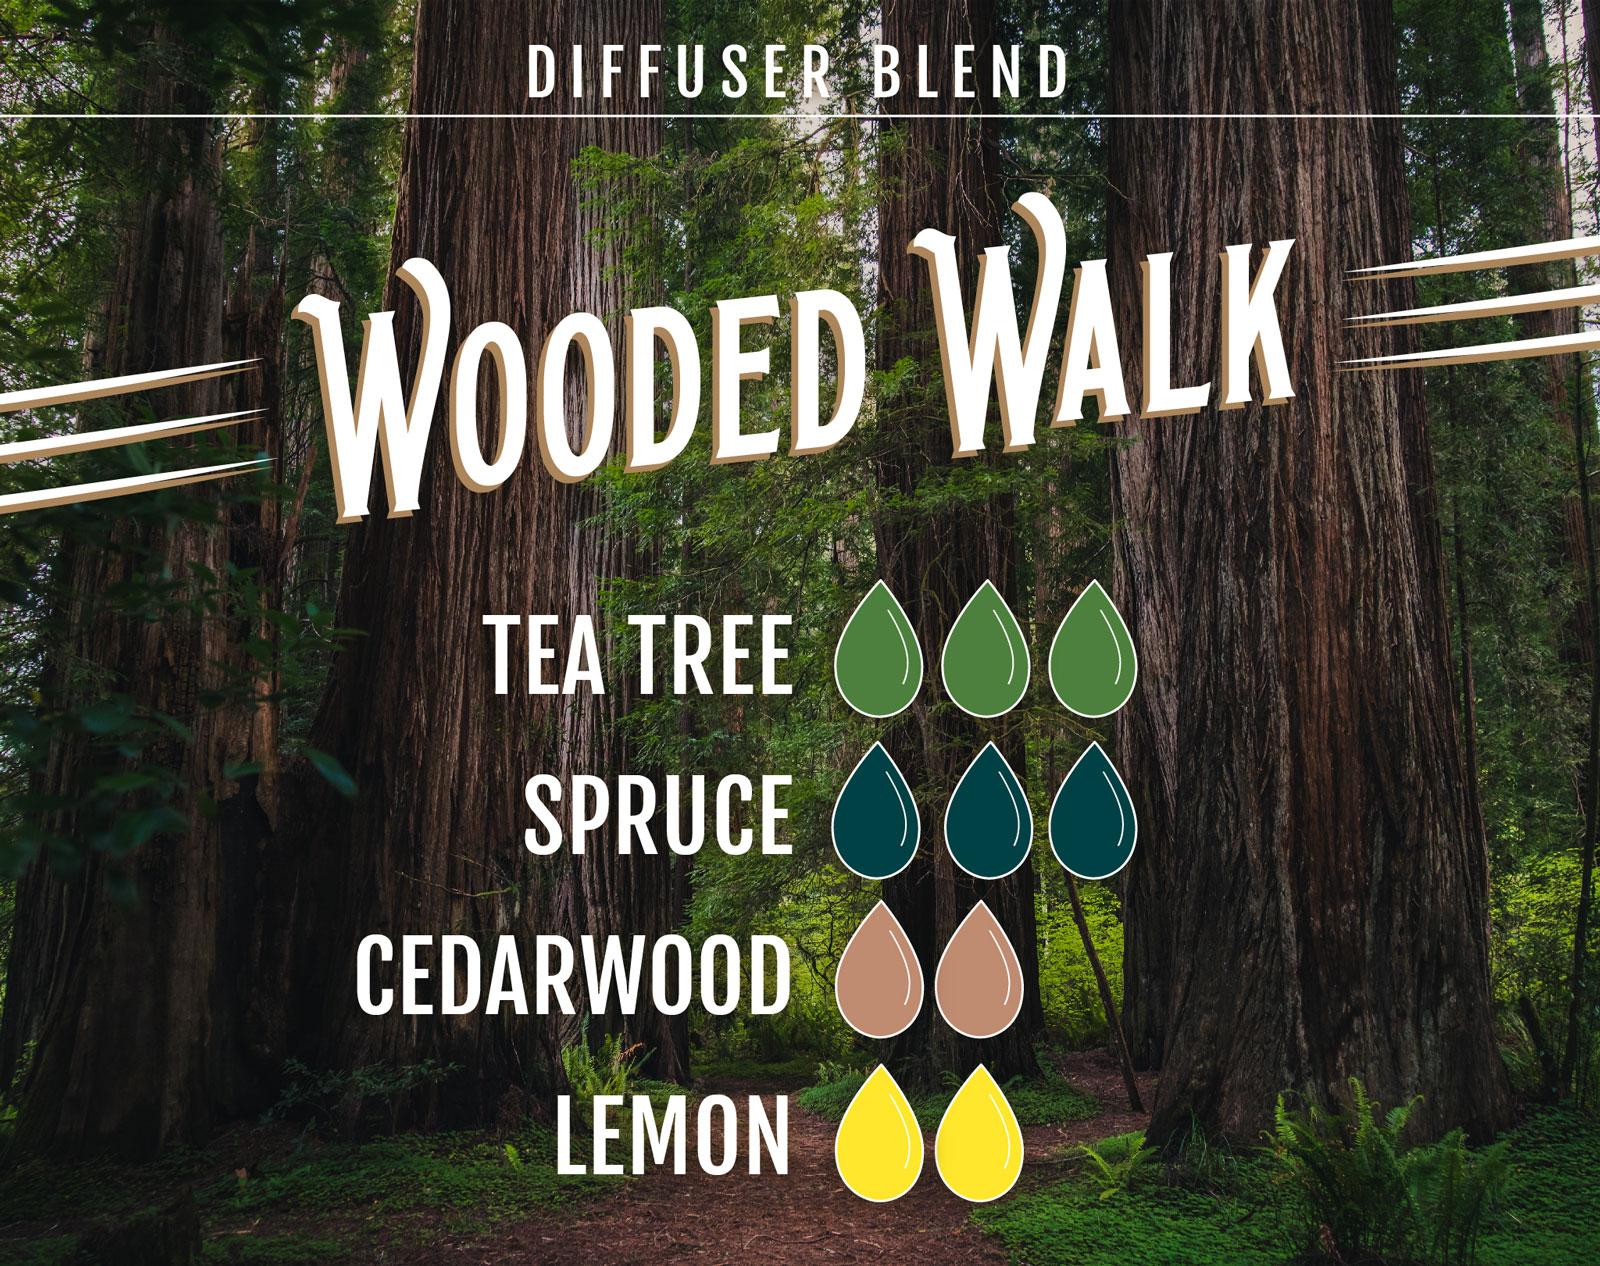 Tea Tree Essential Oil Diffuser Blend Wooded Walk - 3 drops Tea Tree 3 drops Spruce 2 drops Cedarwood 2 drops Lemon